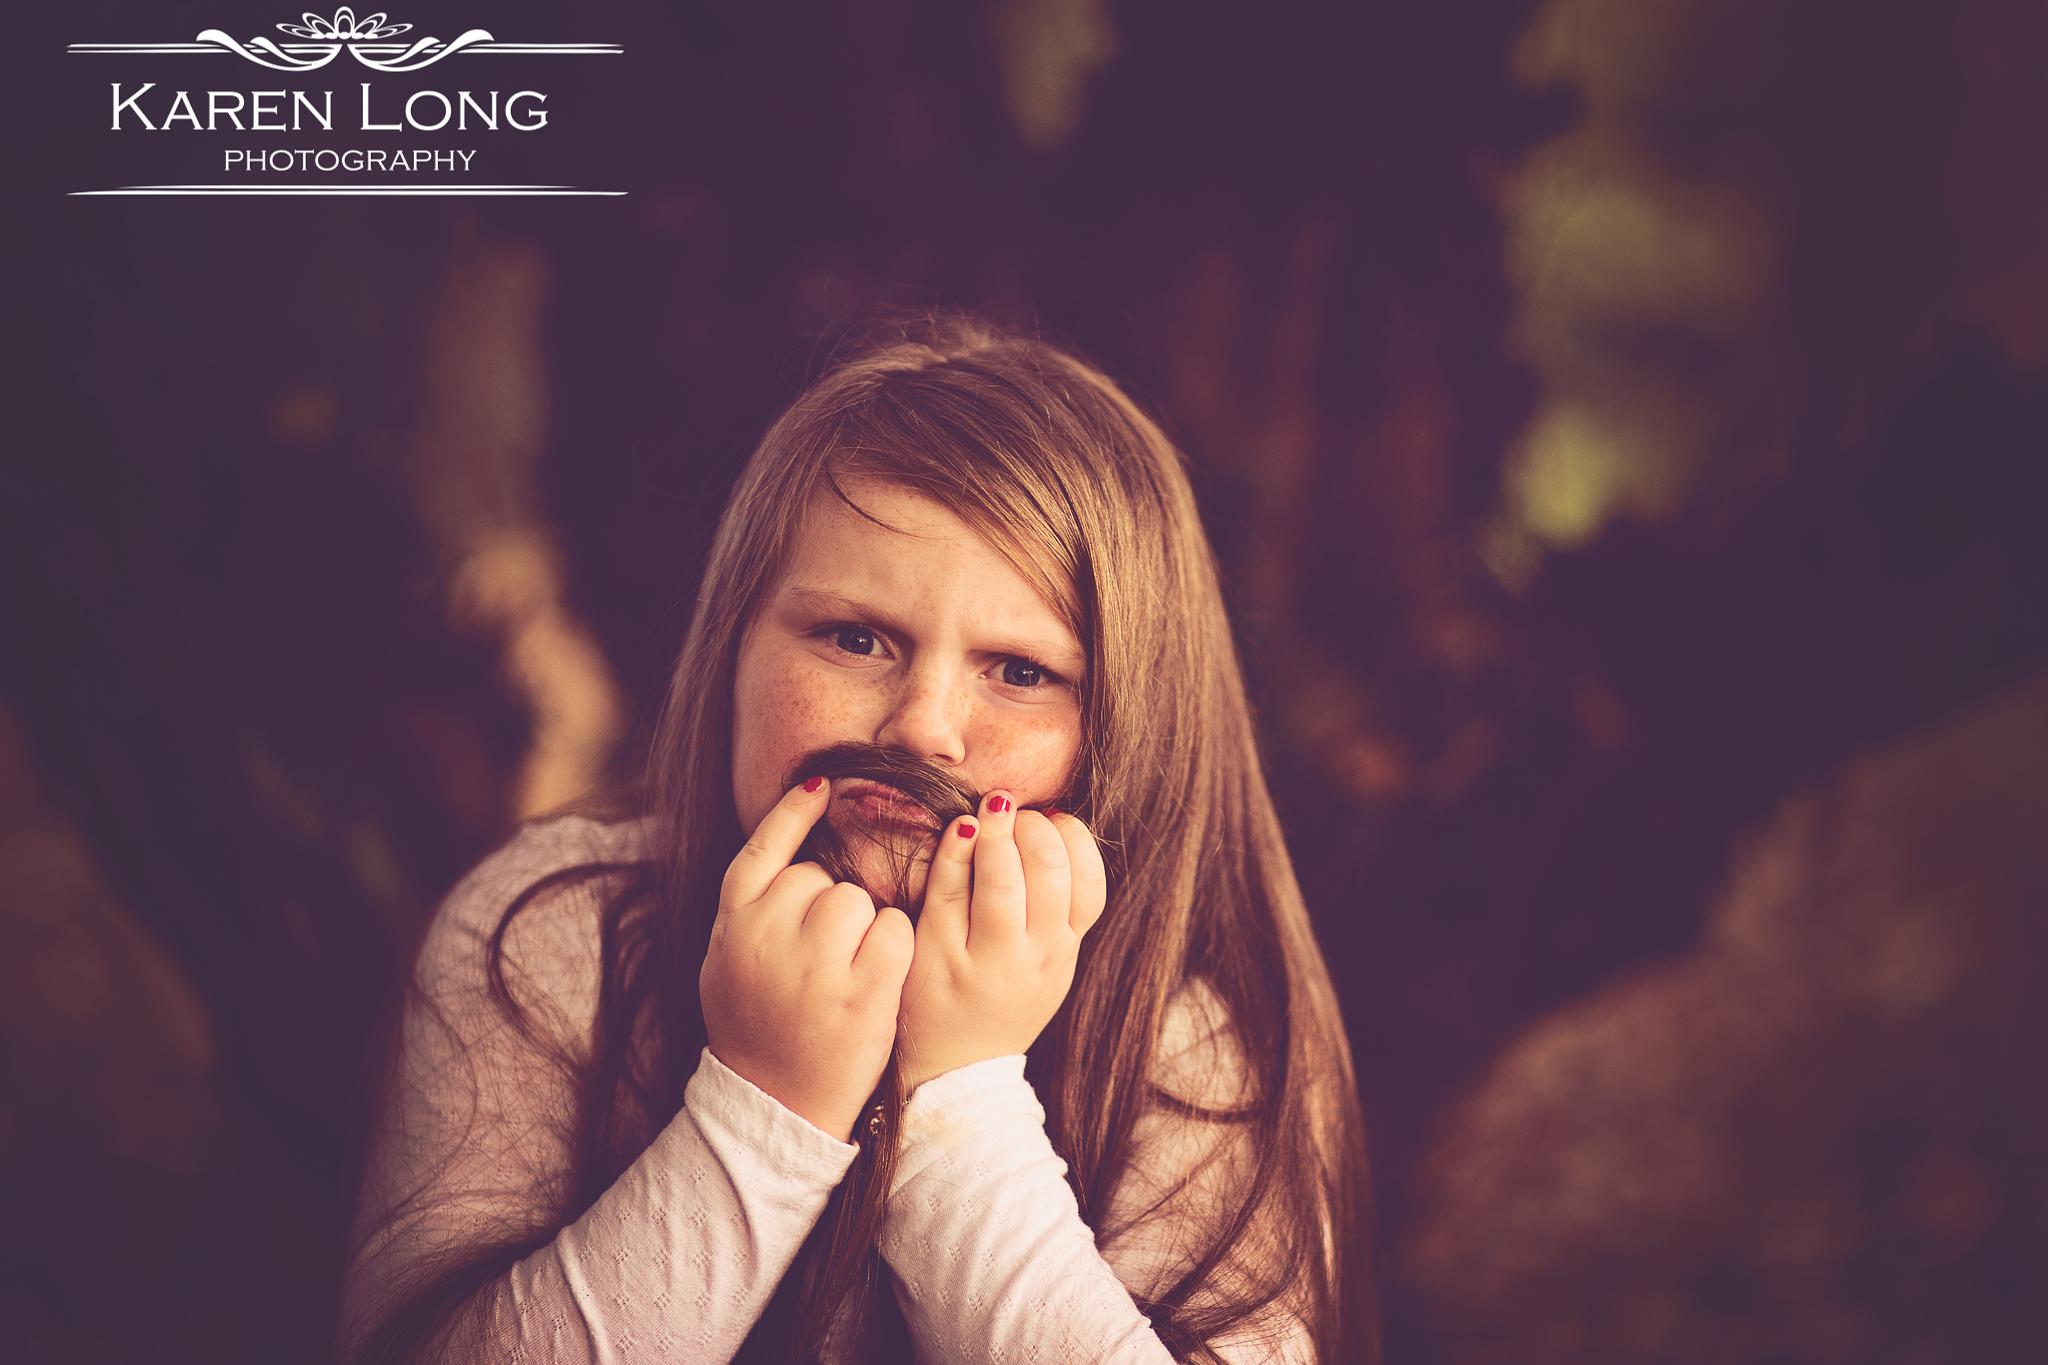 Mustache by karenlongphotography